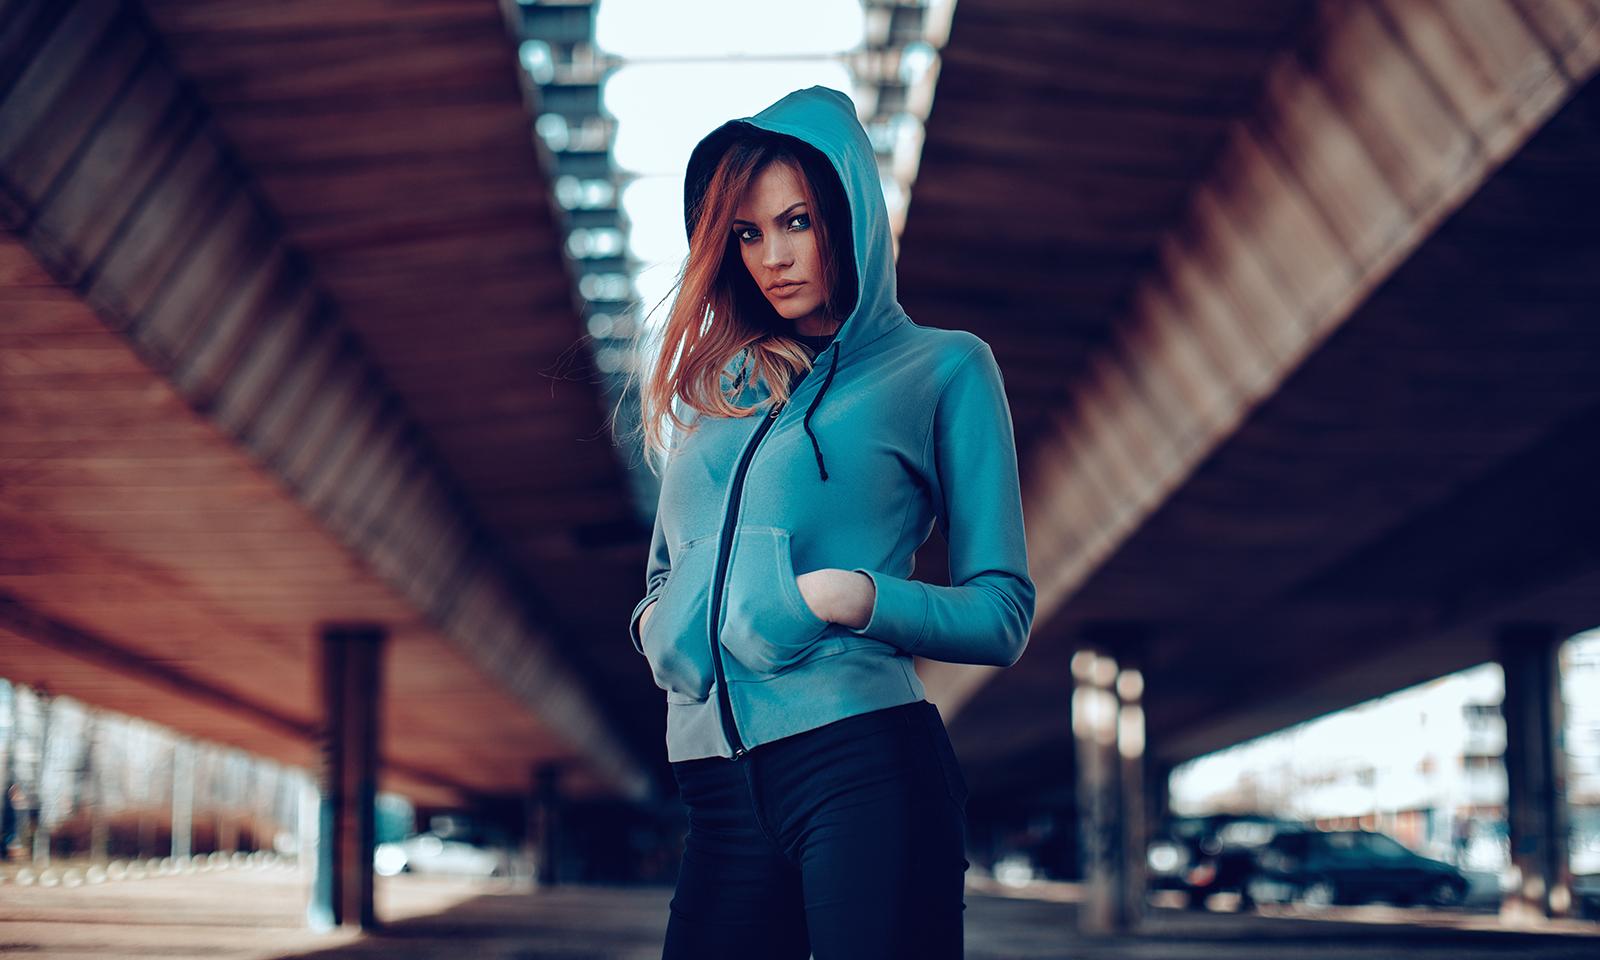 woman-in-athletic-sweatshirt-runner-workout